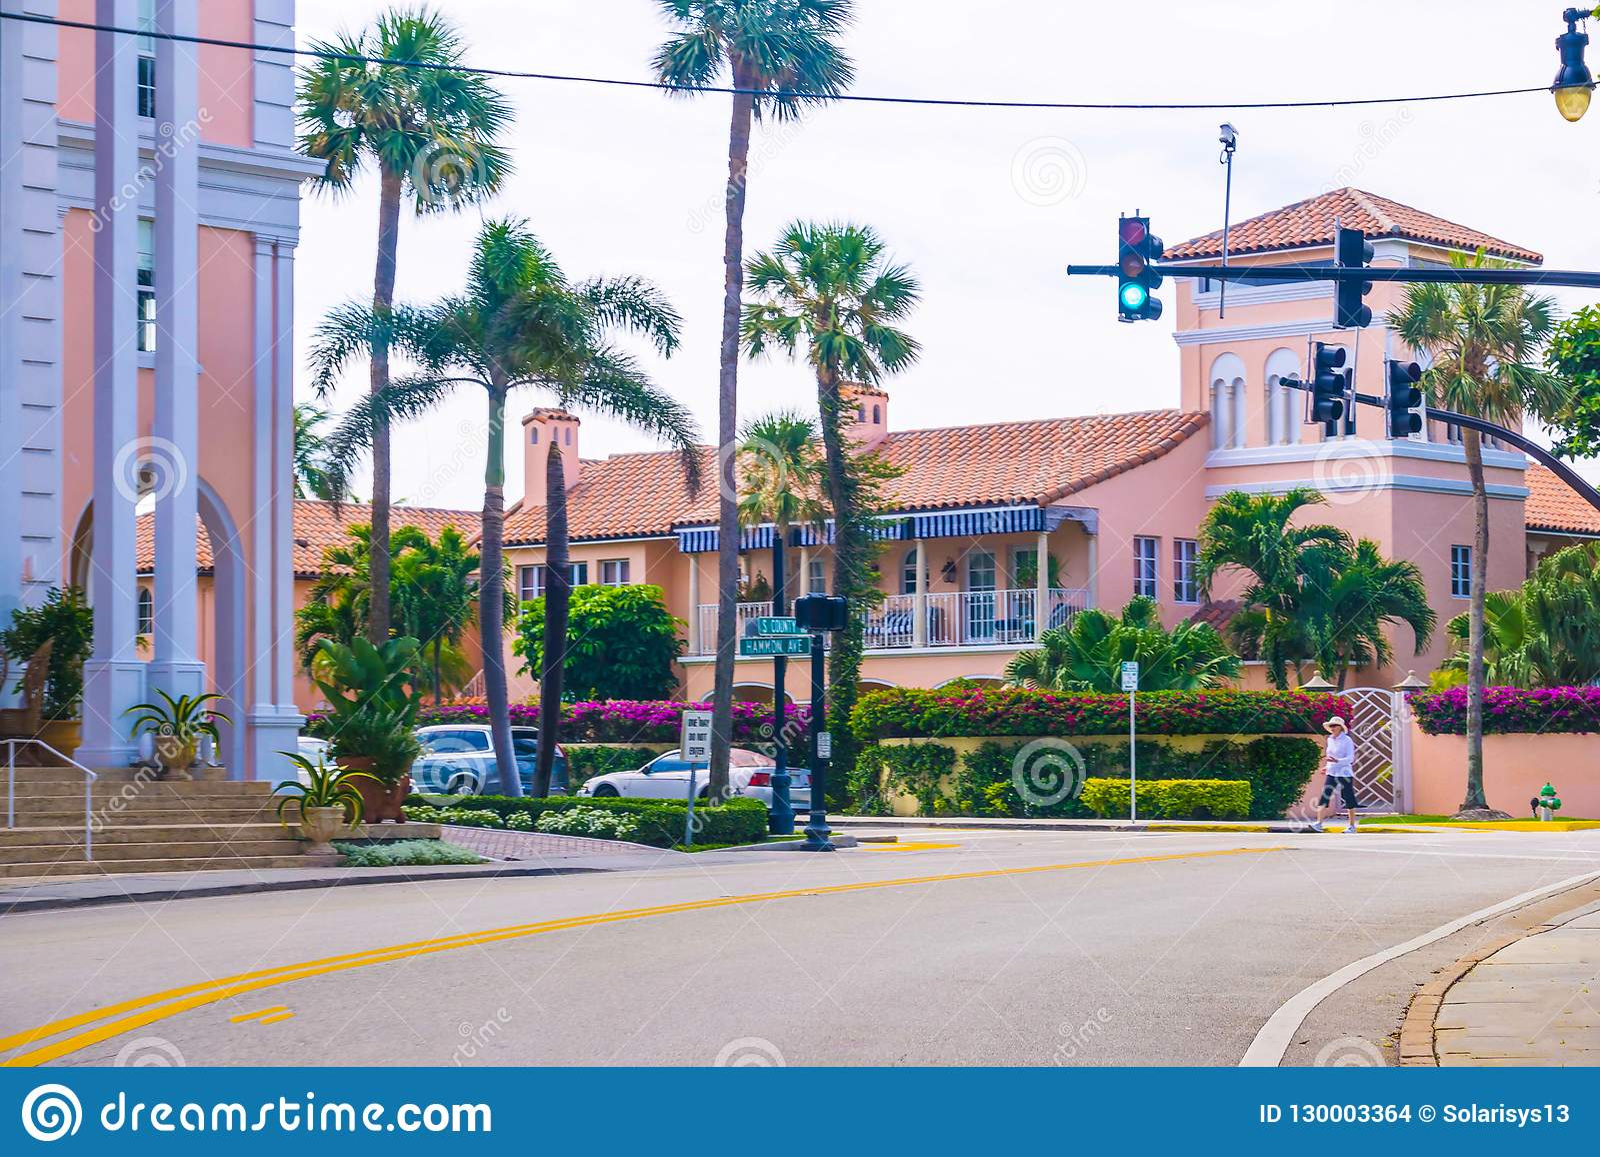 Het WESTENpalm beach, Florida -7 Mei 2018: De weg met auto s bij Palm Beach, Florida, Verenigde Staten